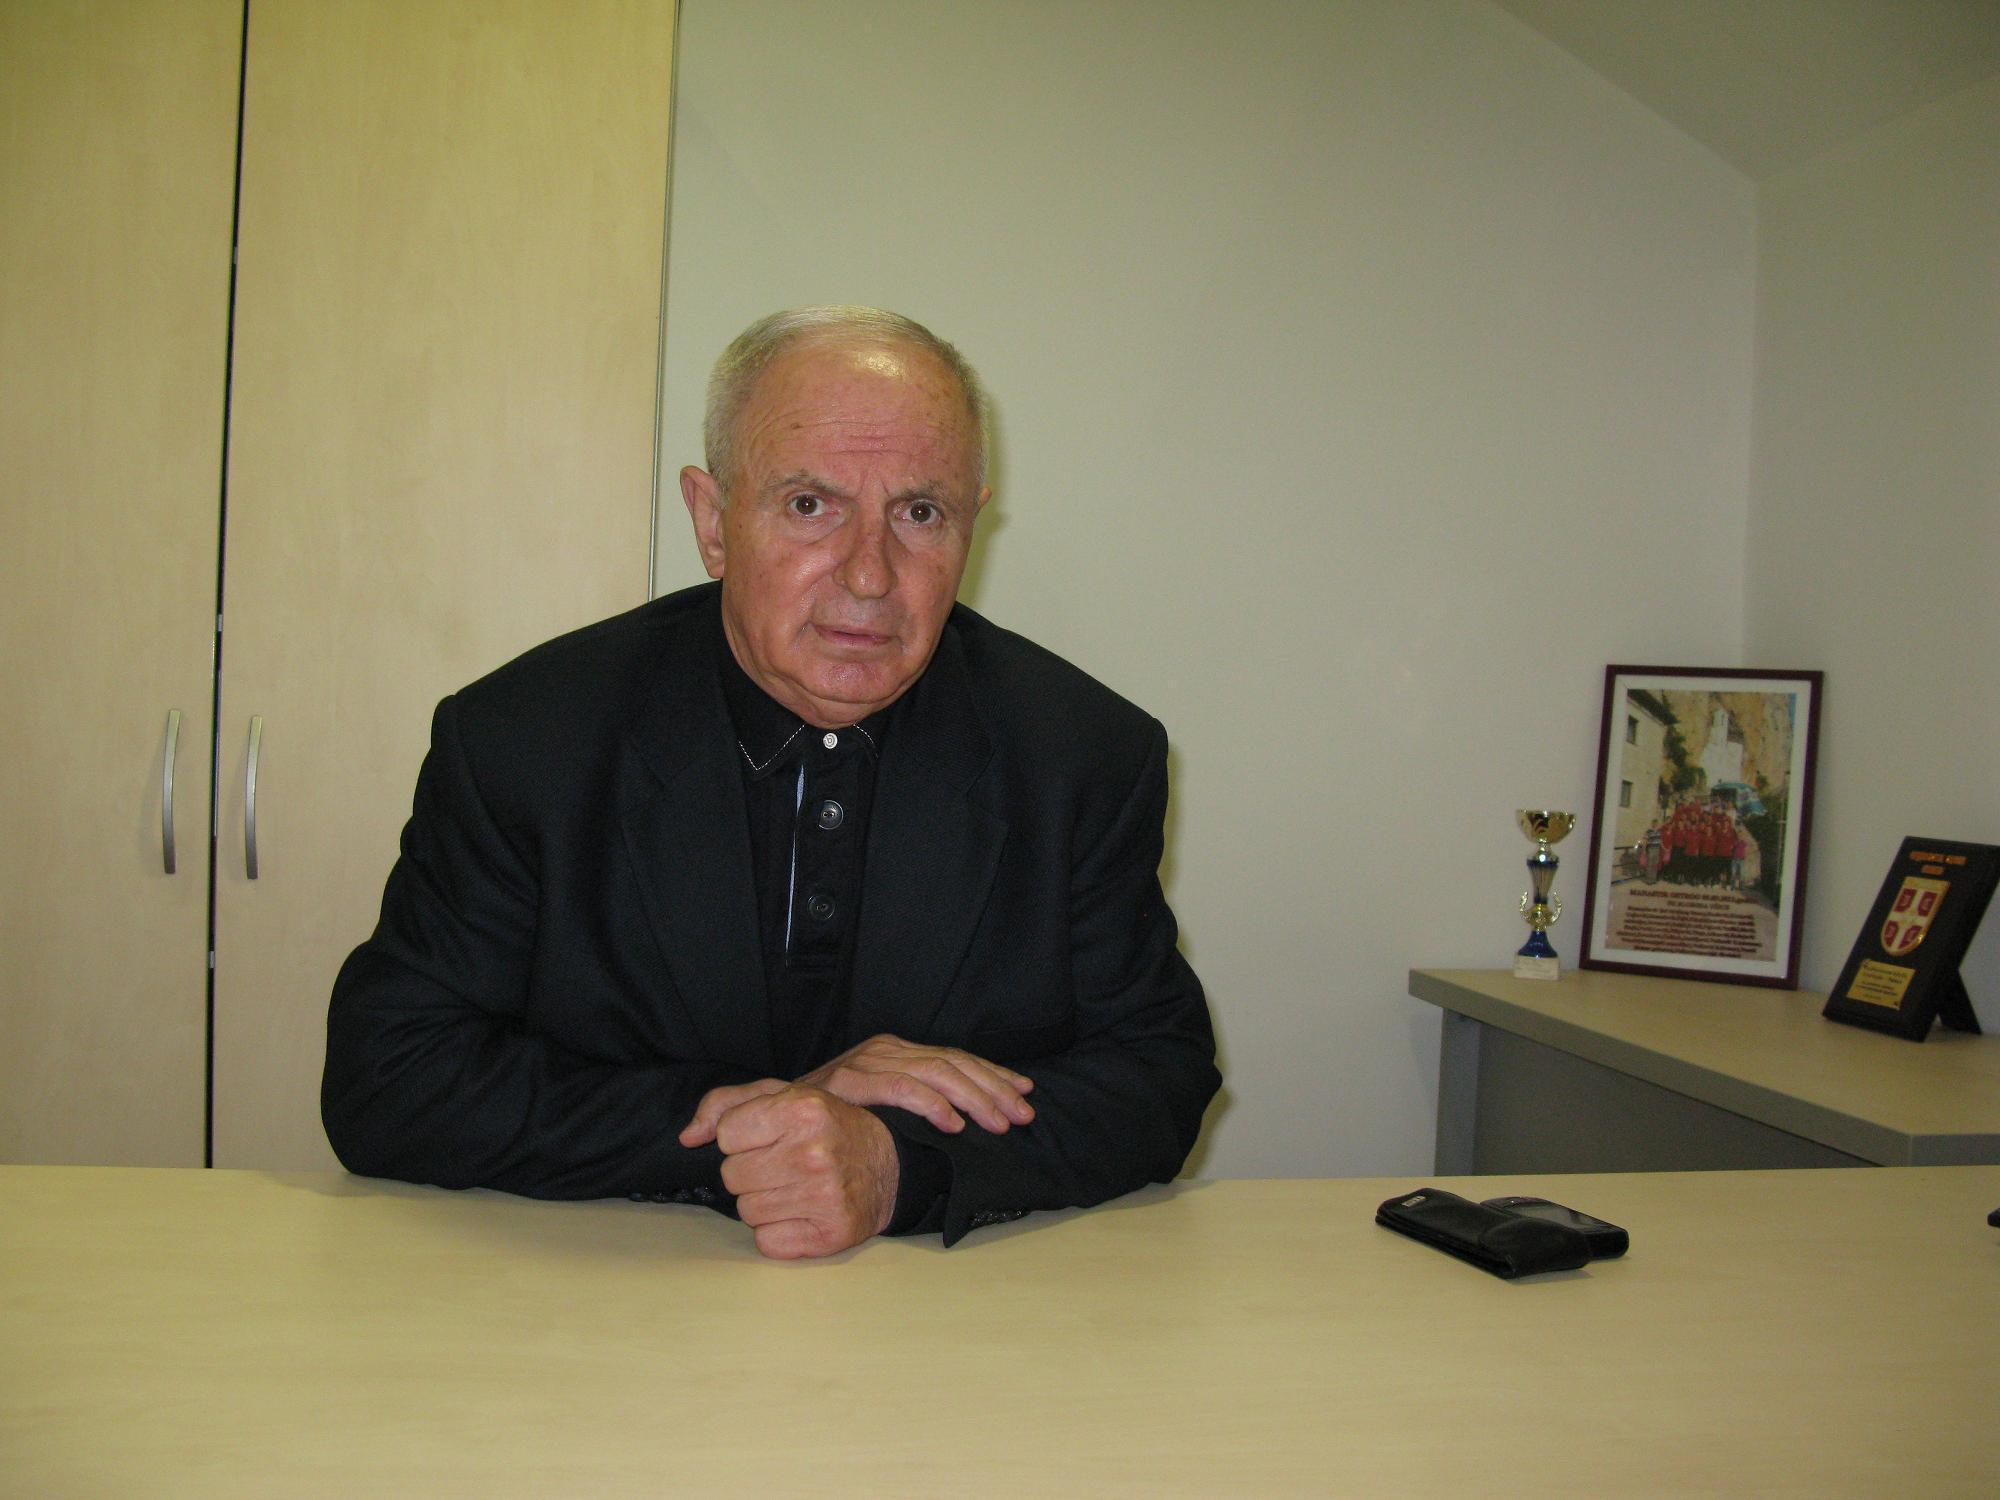 JOSIP RISTANOVIC